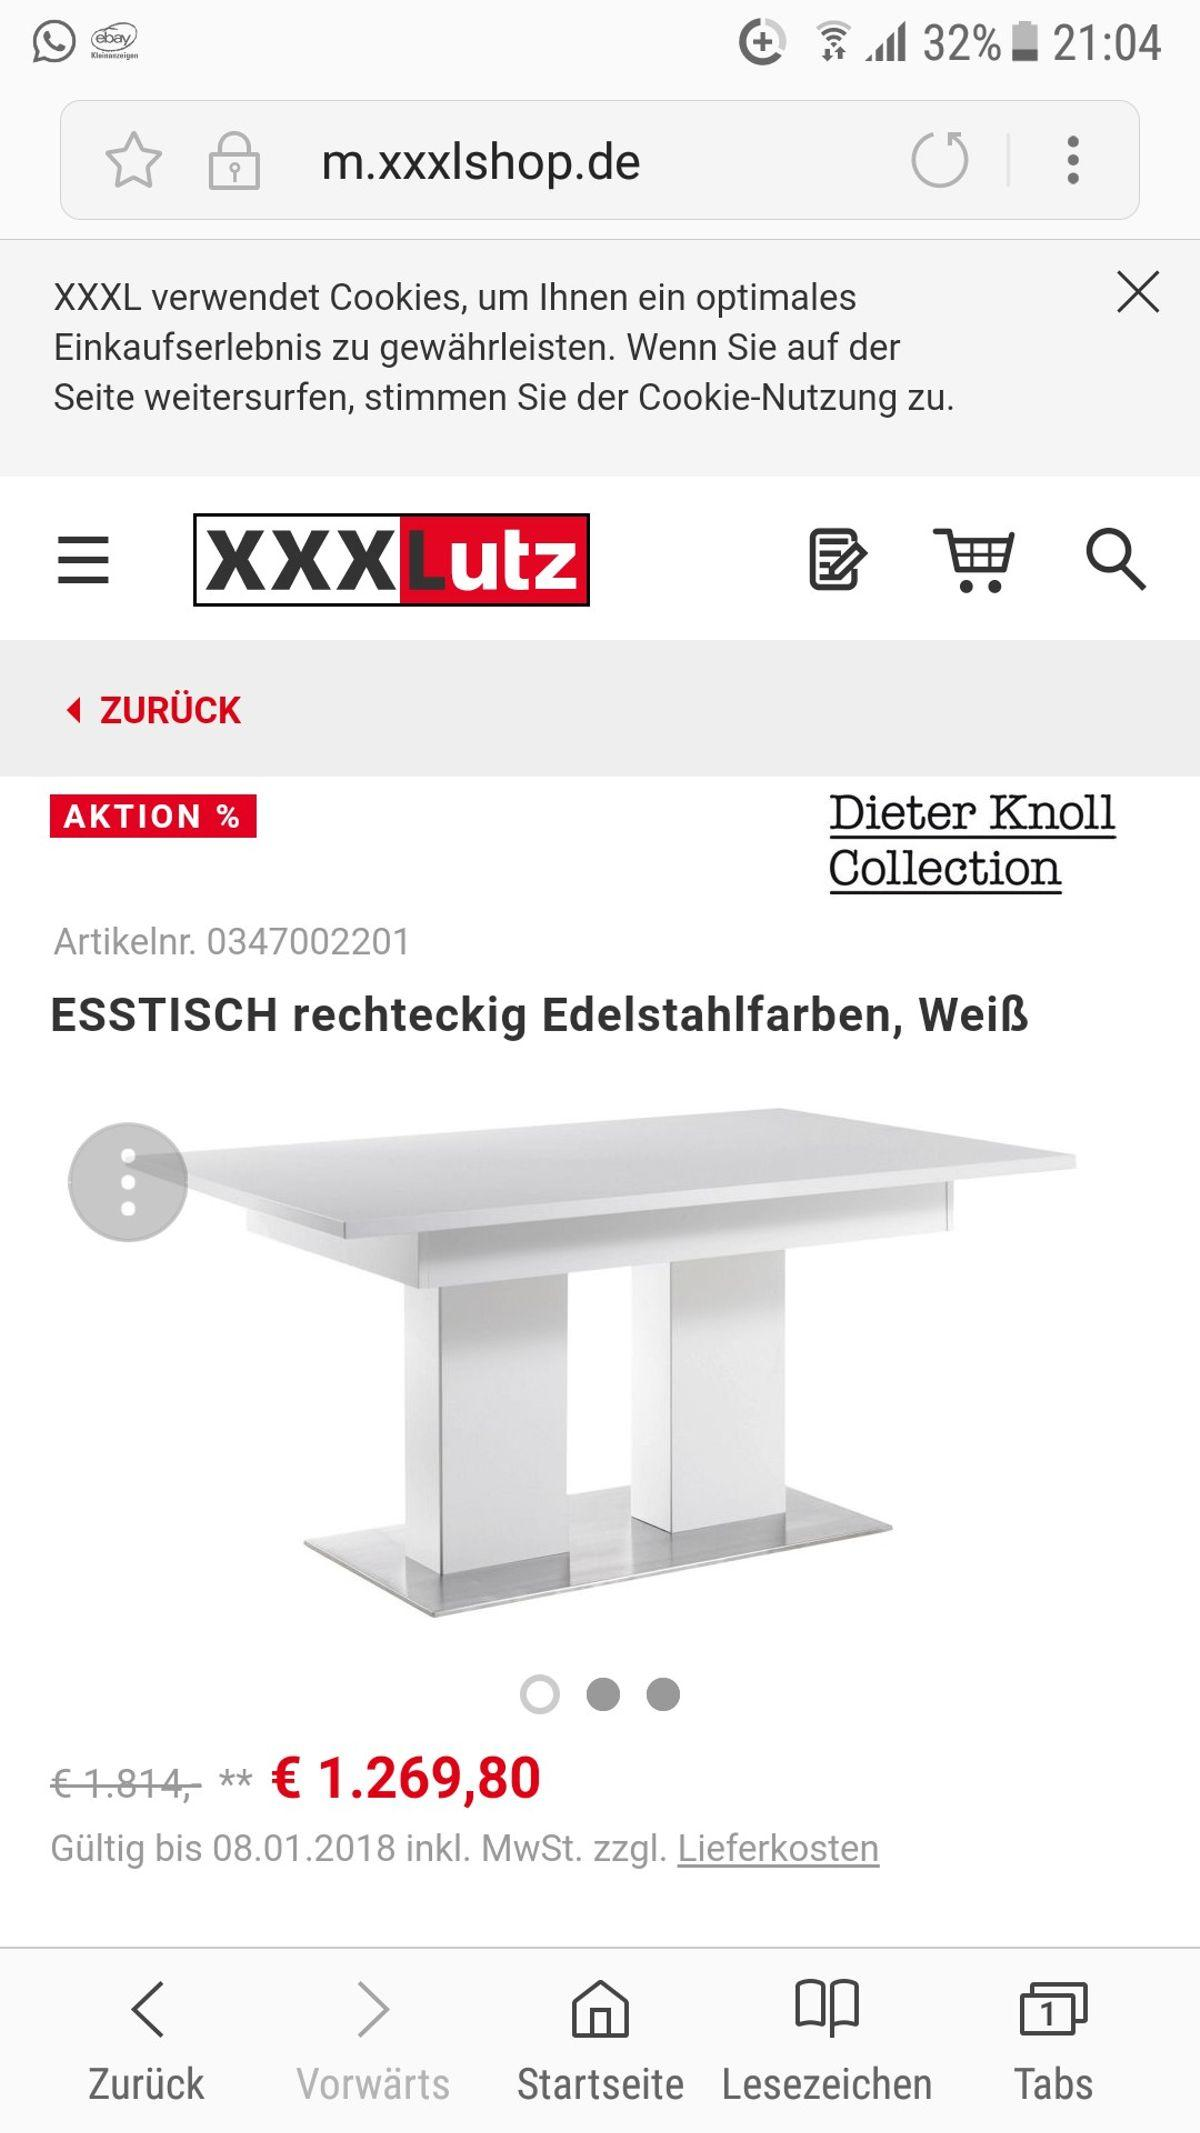 Dieter Knoll Esstisch Keramik